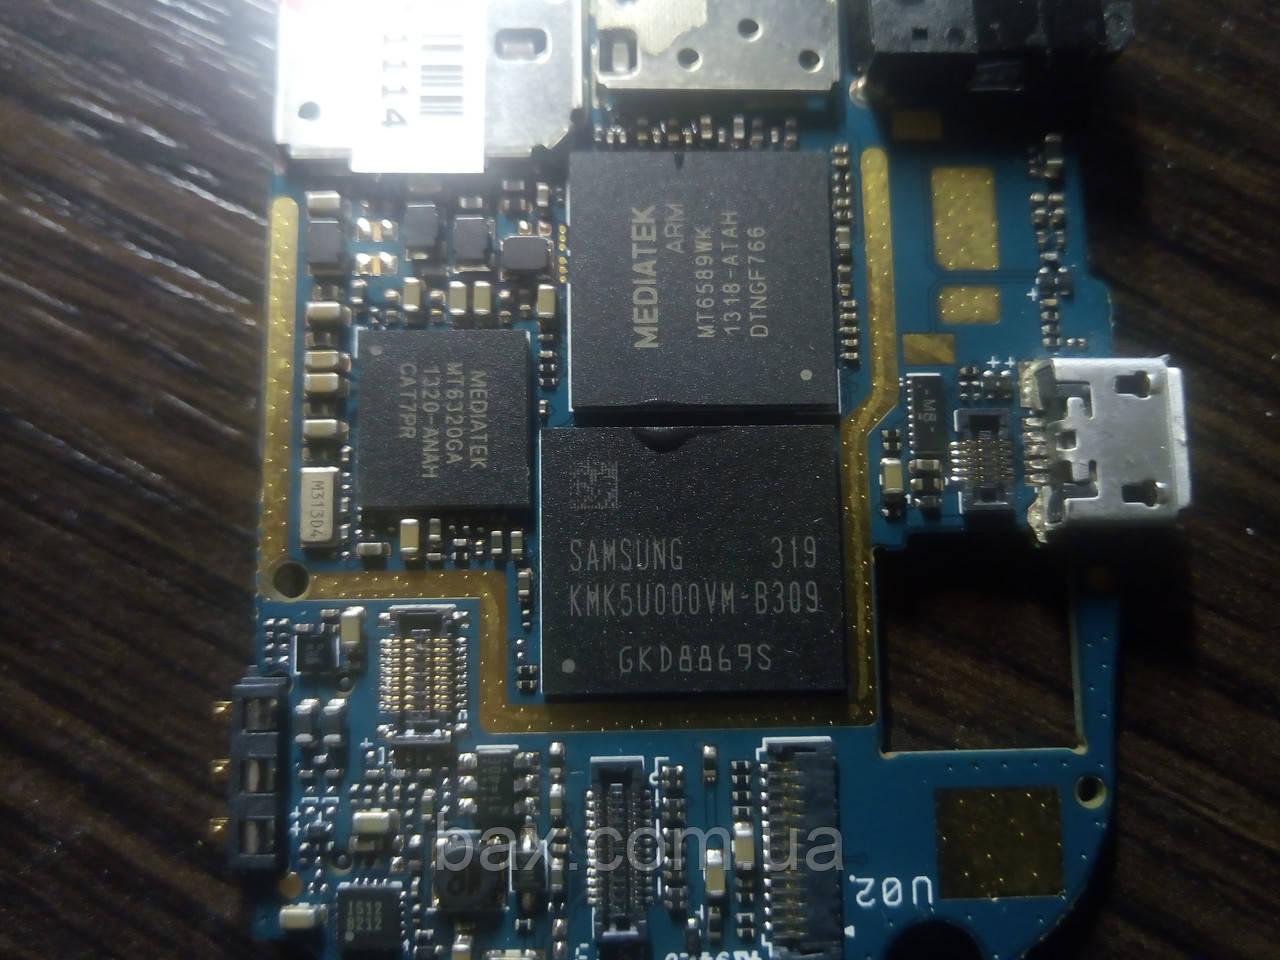 Микросхема памяти Samsung KMK5U000VM-B309 На плате